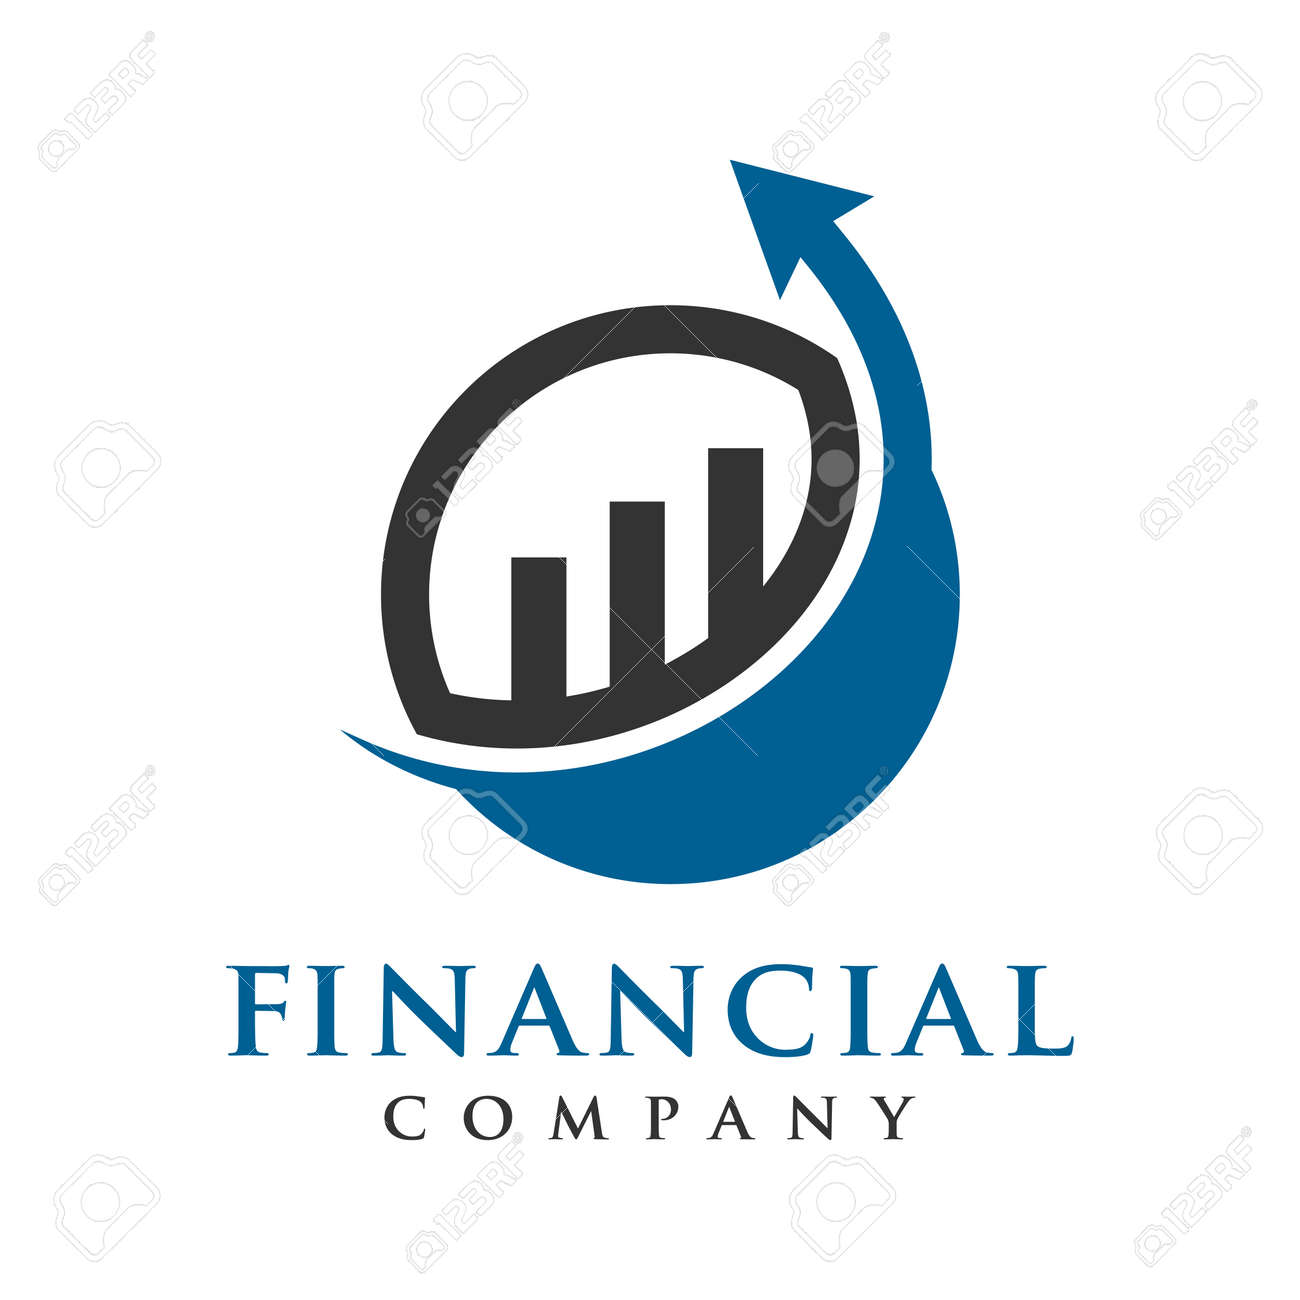 marketing and financial business logo design - 143872826